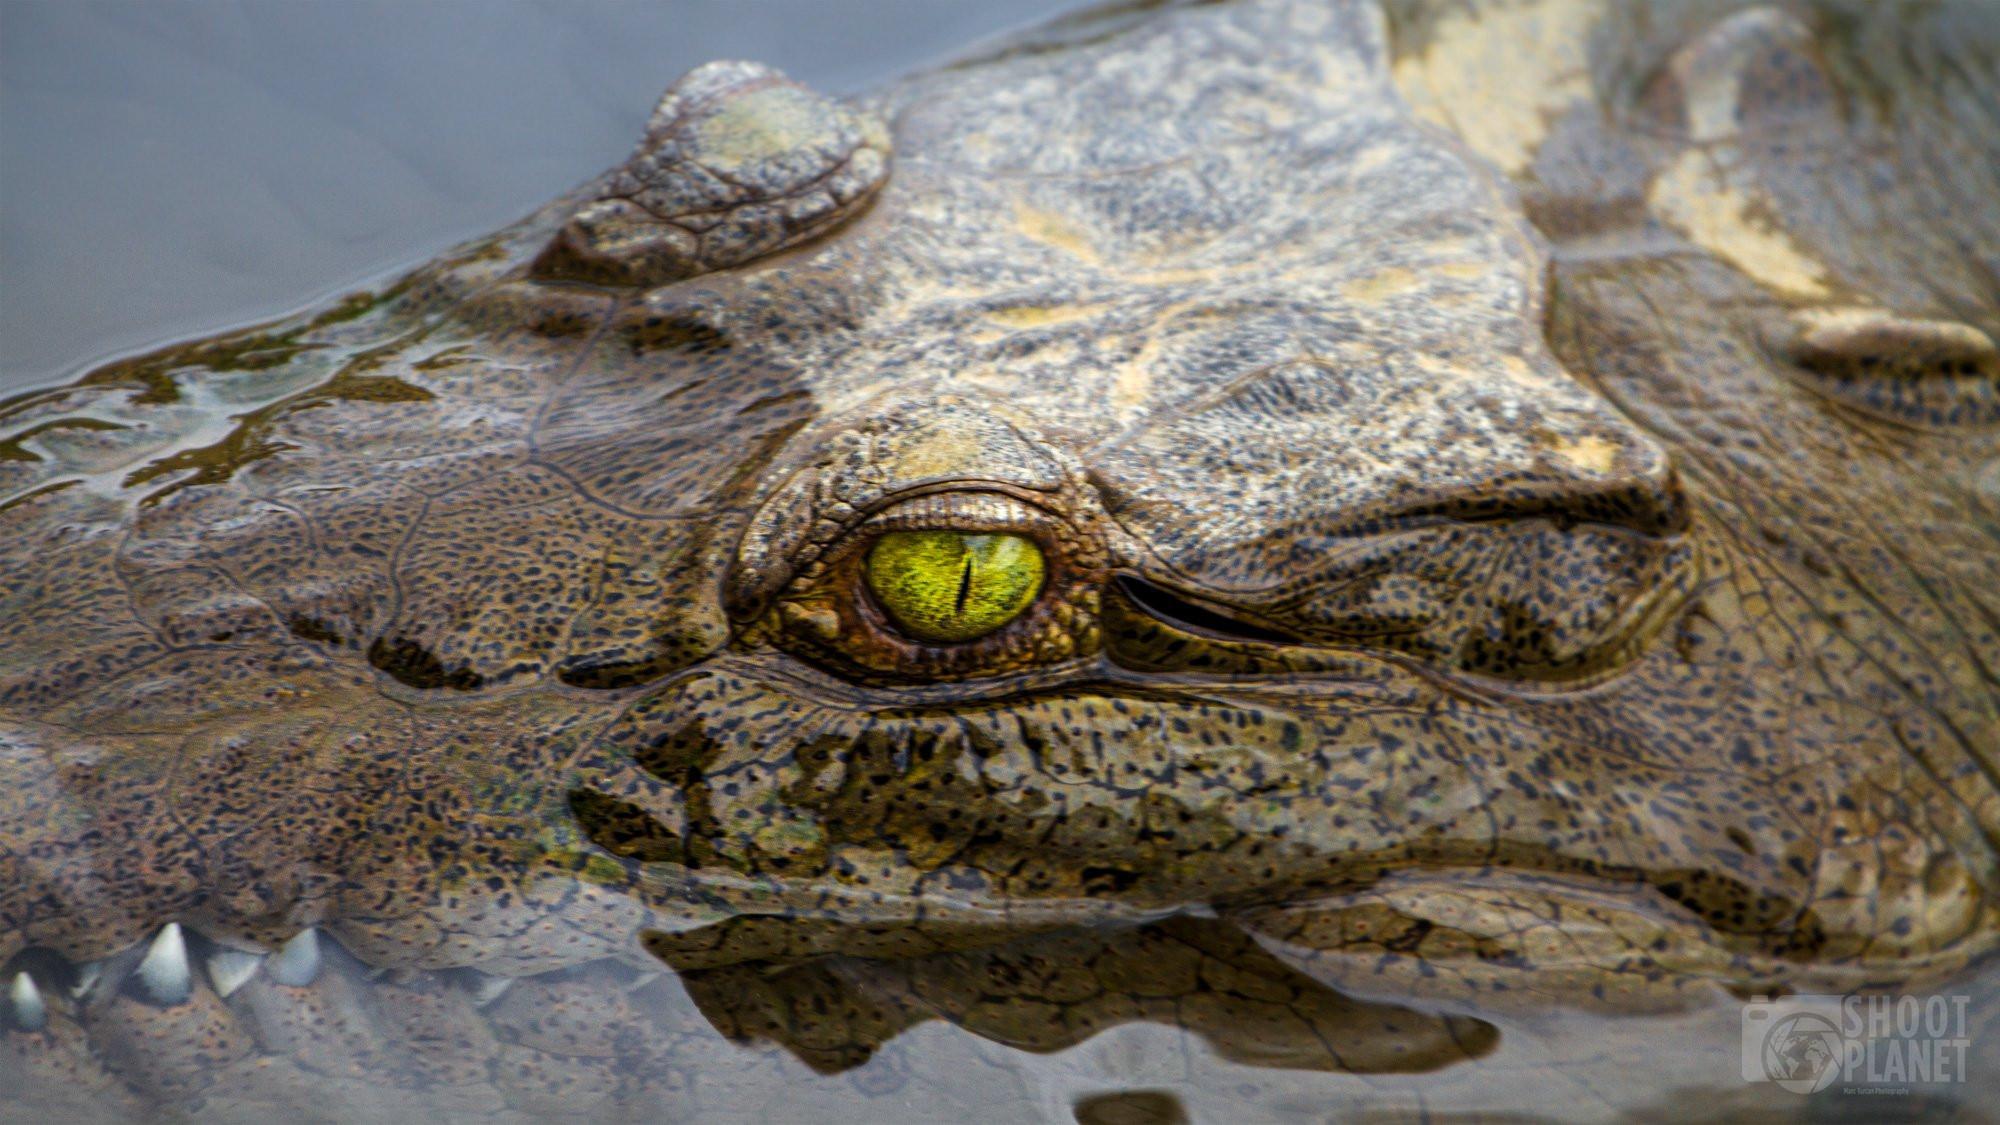 White caiman eye in Costa Rica